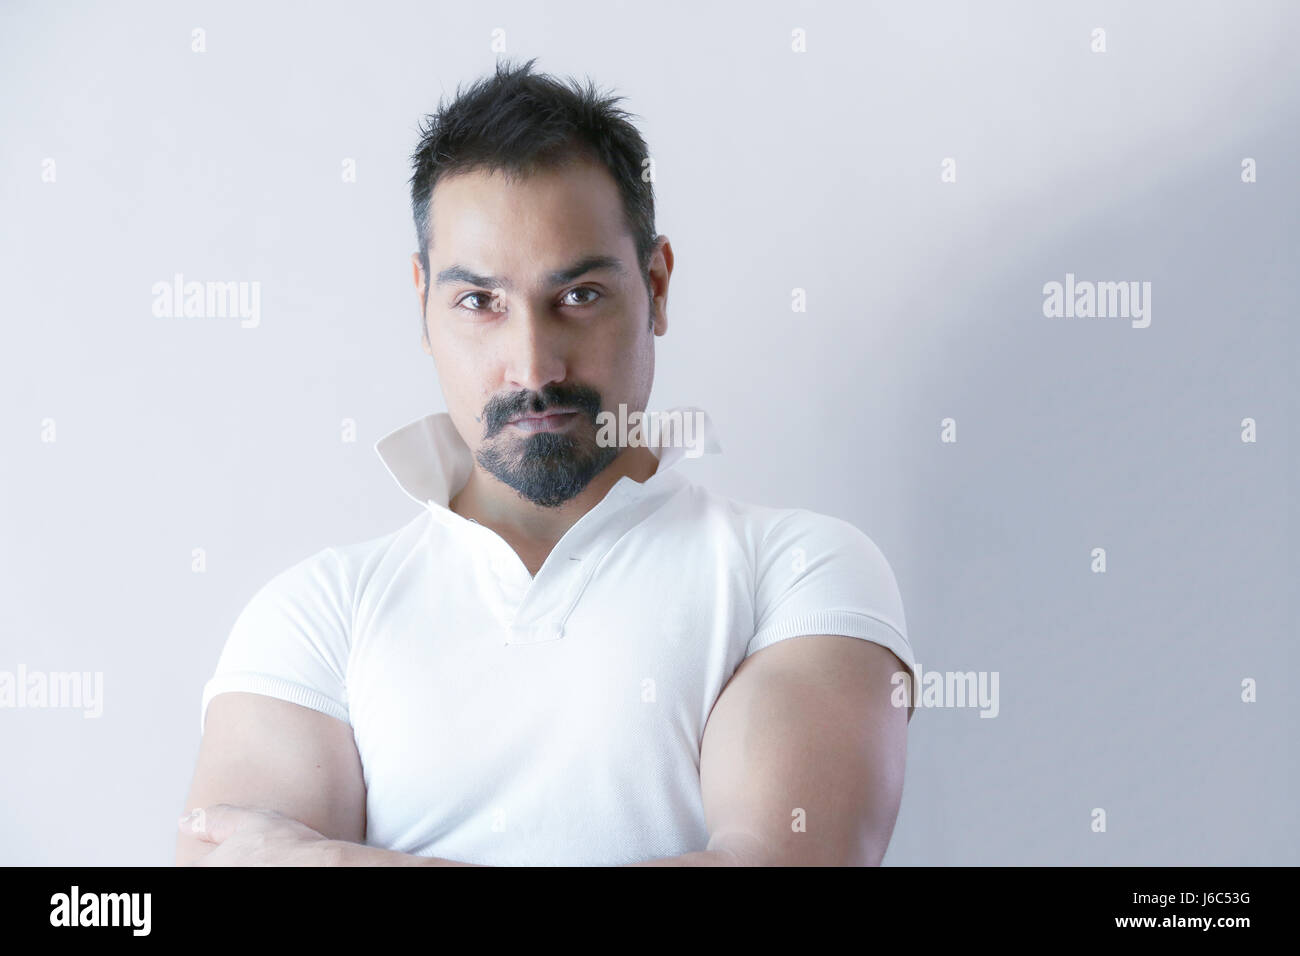 Male Model Short Hair Beard White T Shirt And White Background Stock Photo Alamy